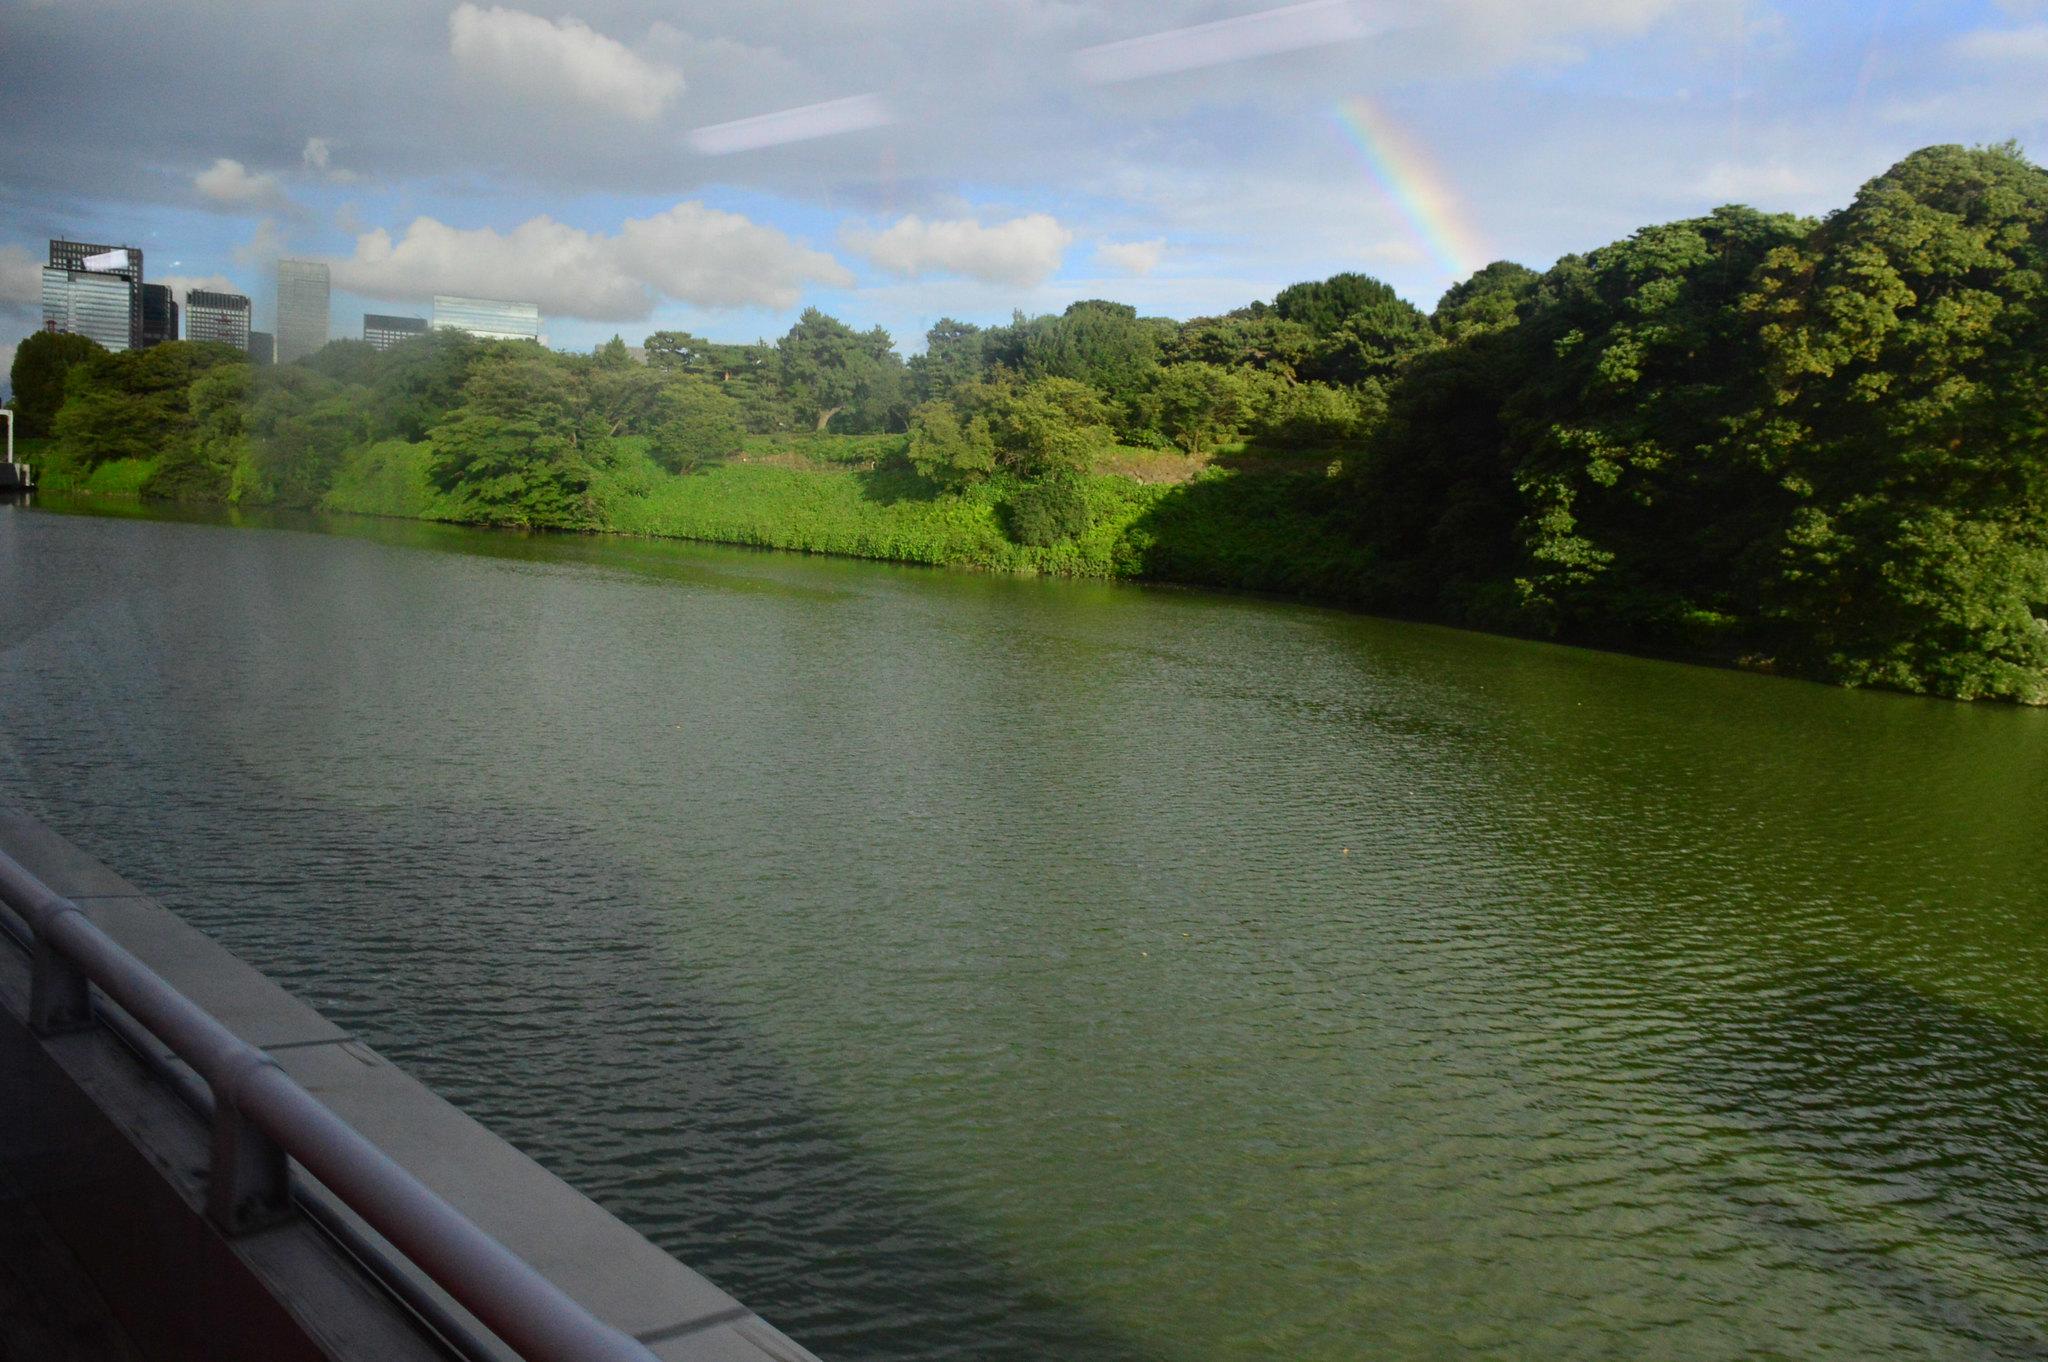 Rainbow spotted on the way to Shinjuku